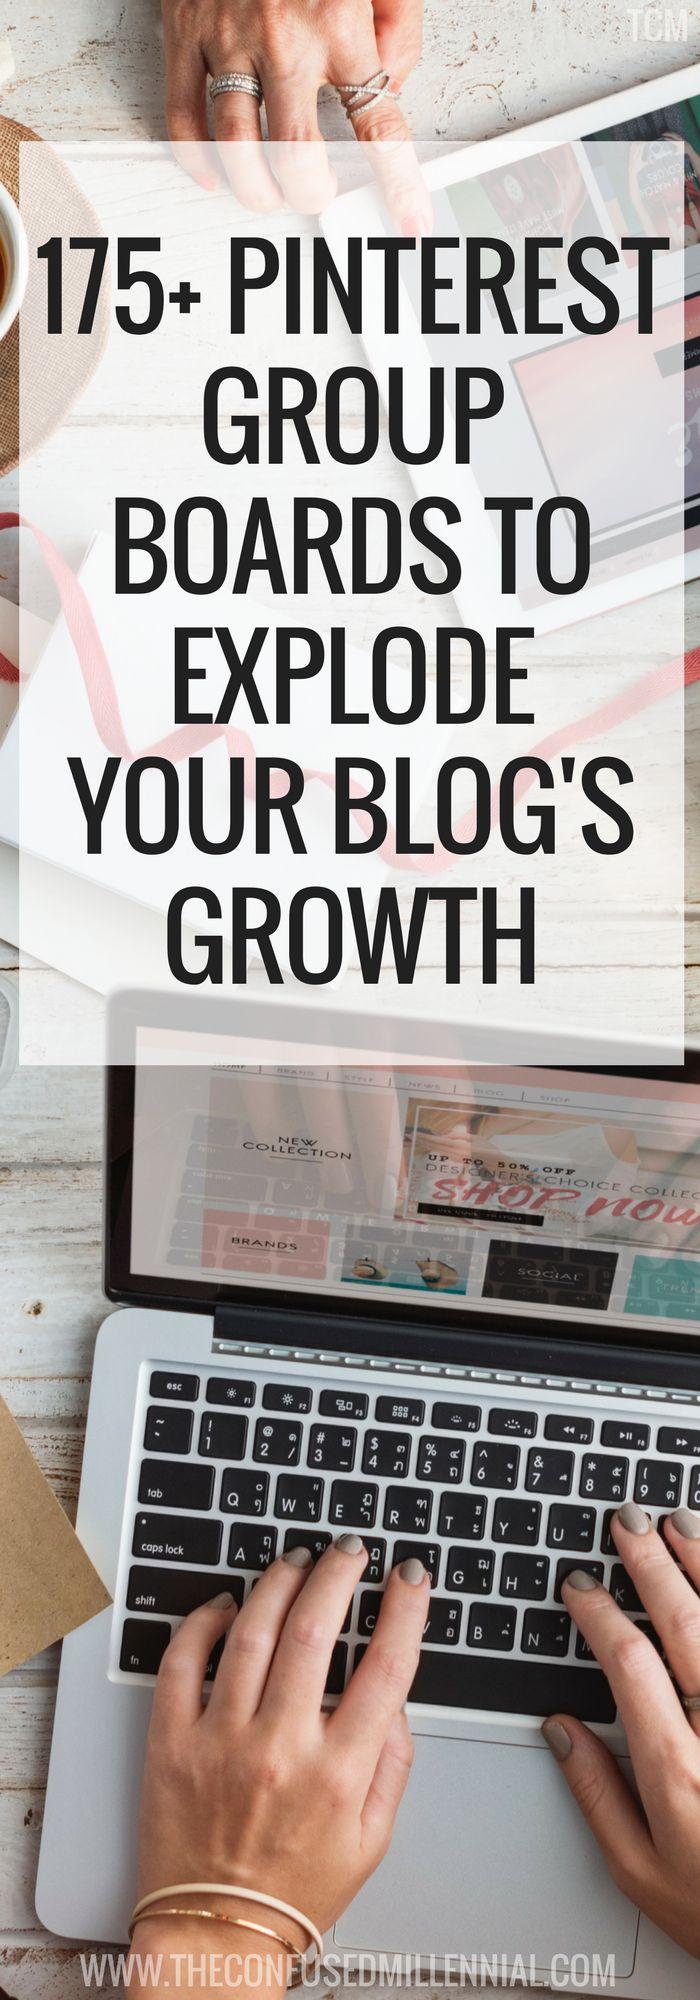 Pinterest tips | blogging tips | list of group boards